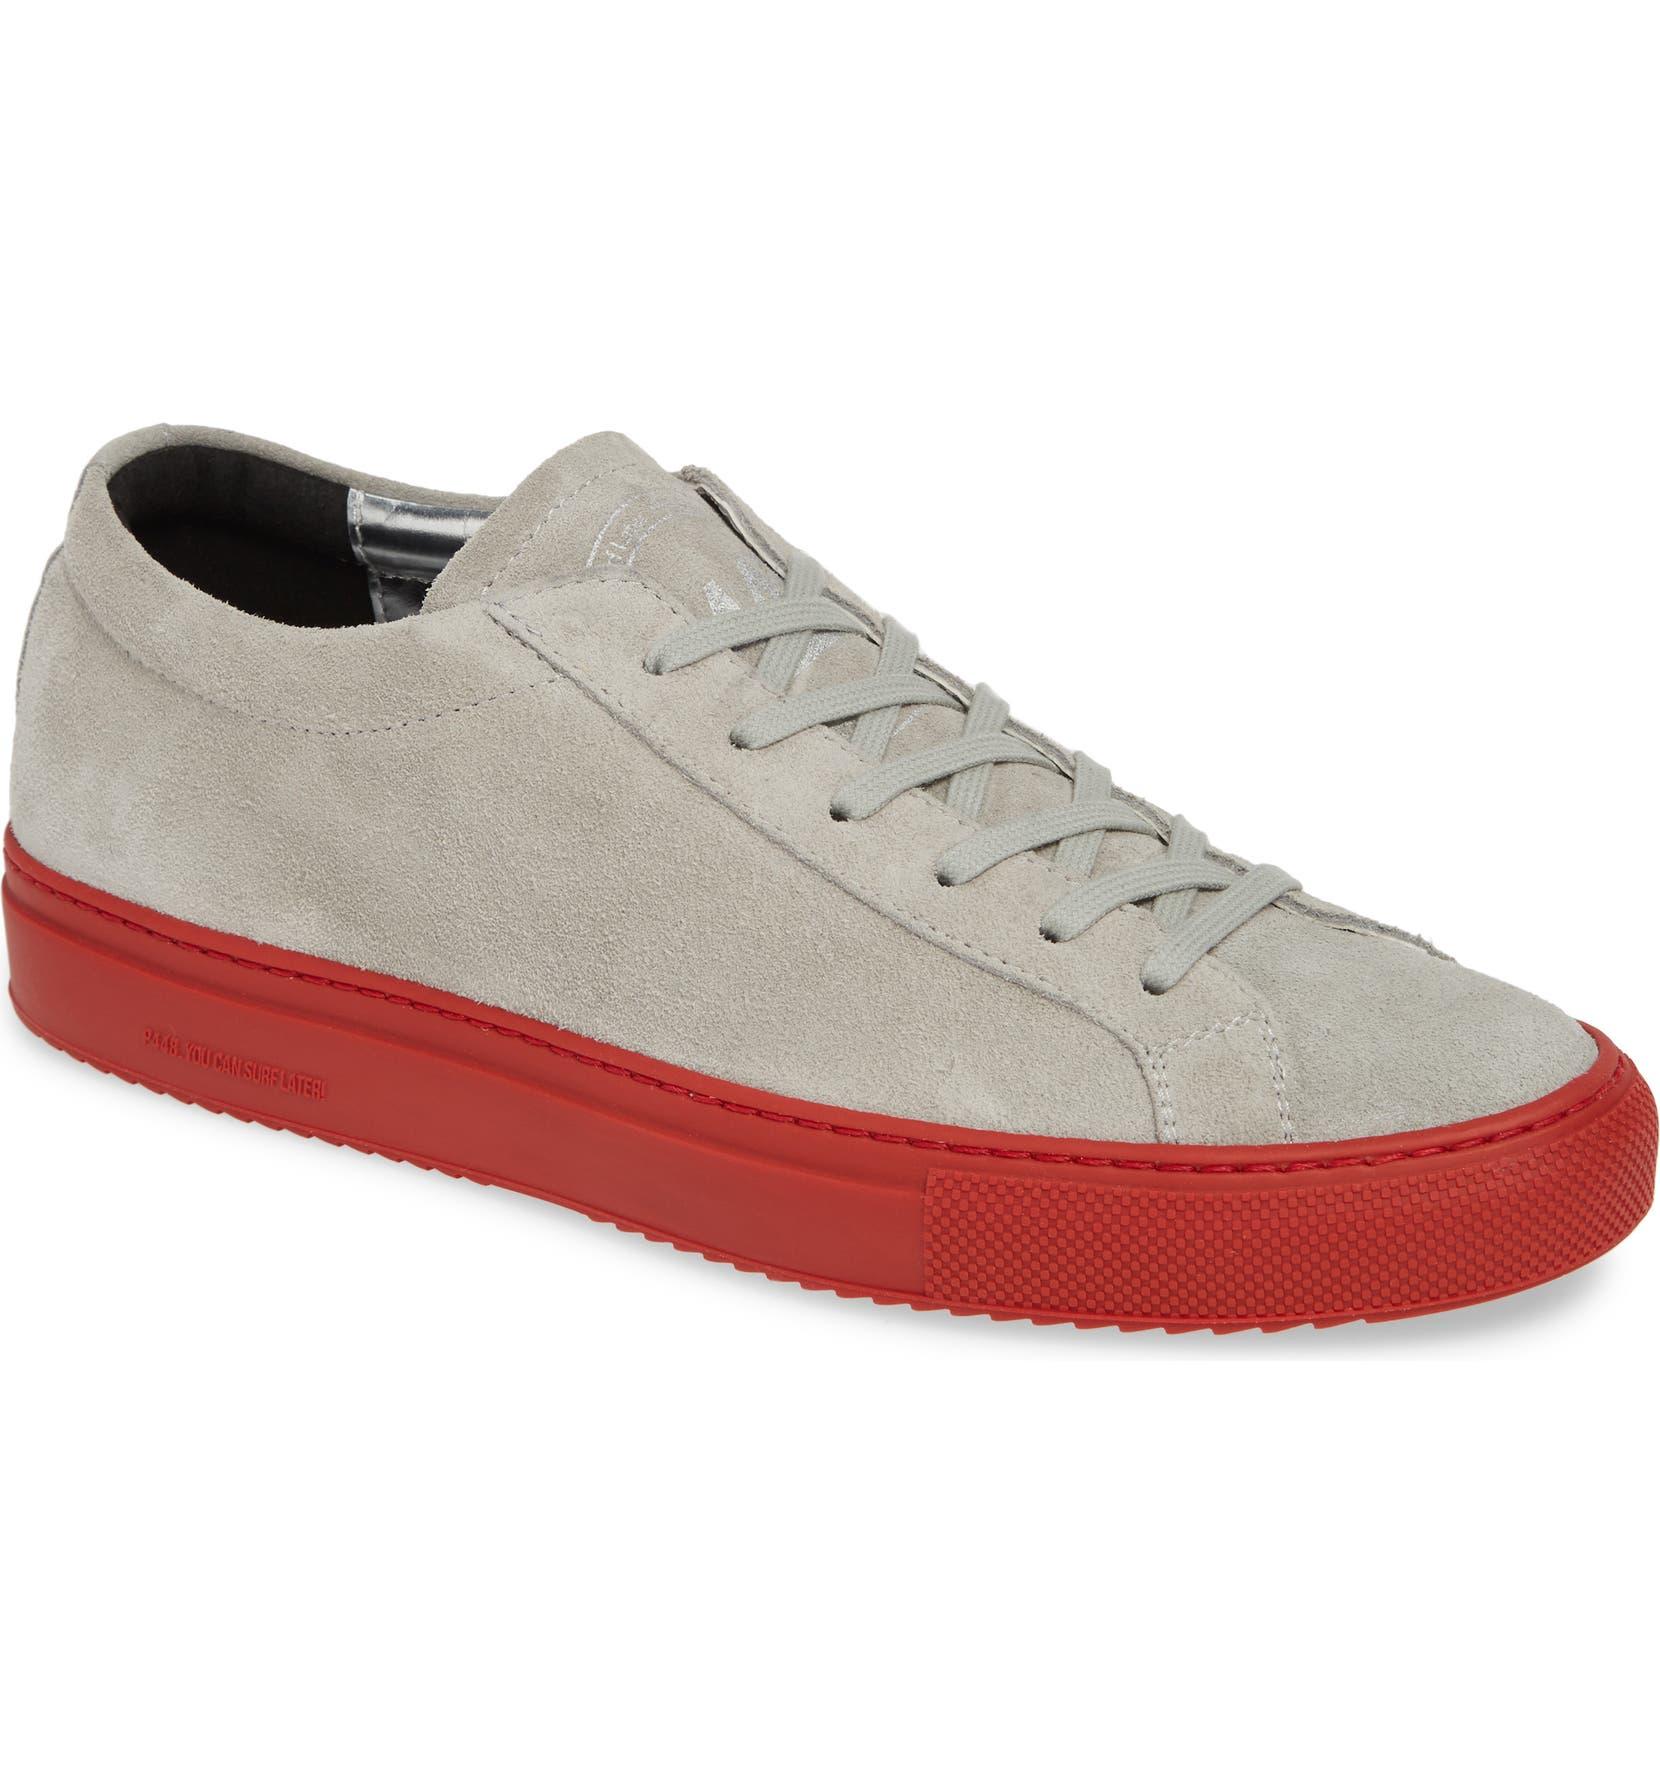 b81a5a05bf9 P448 Onef Low Top Sneaker (Men)